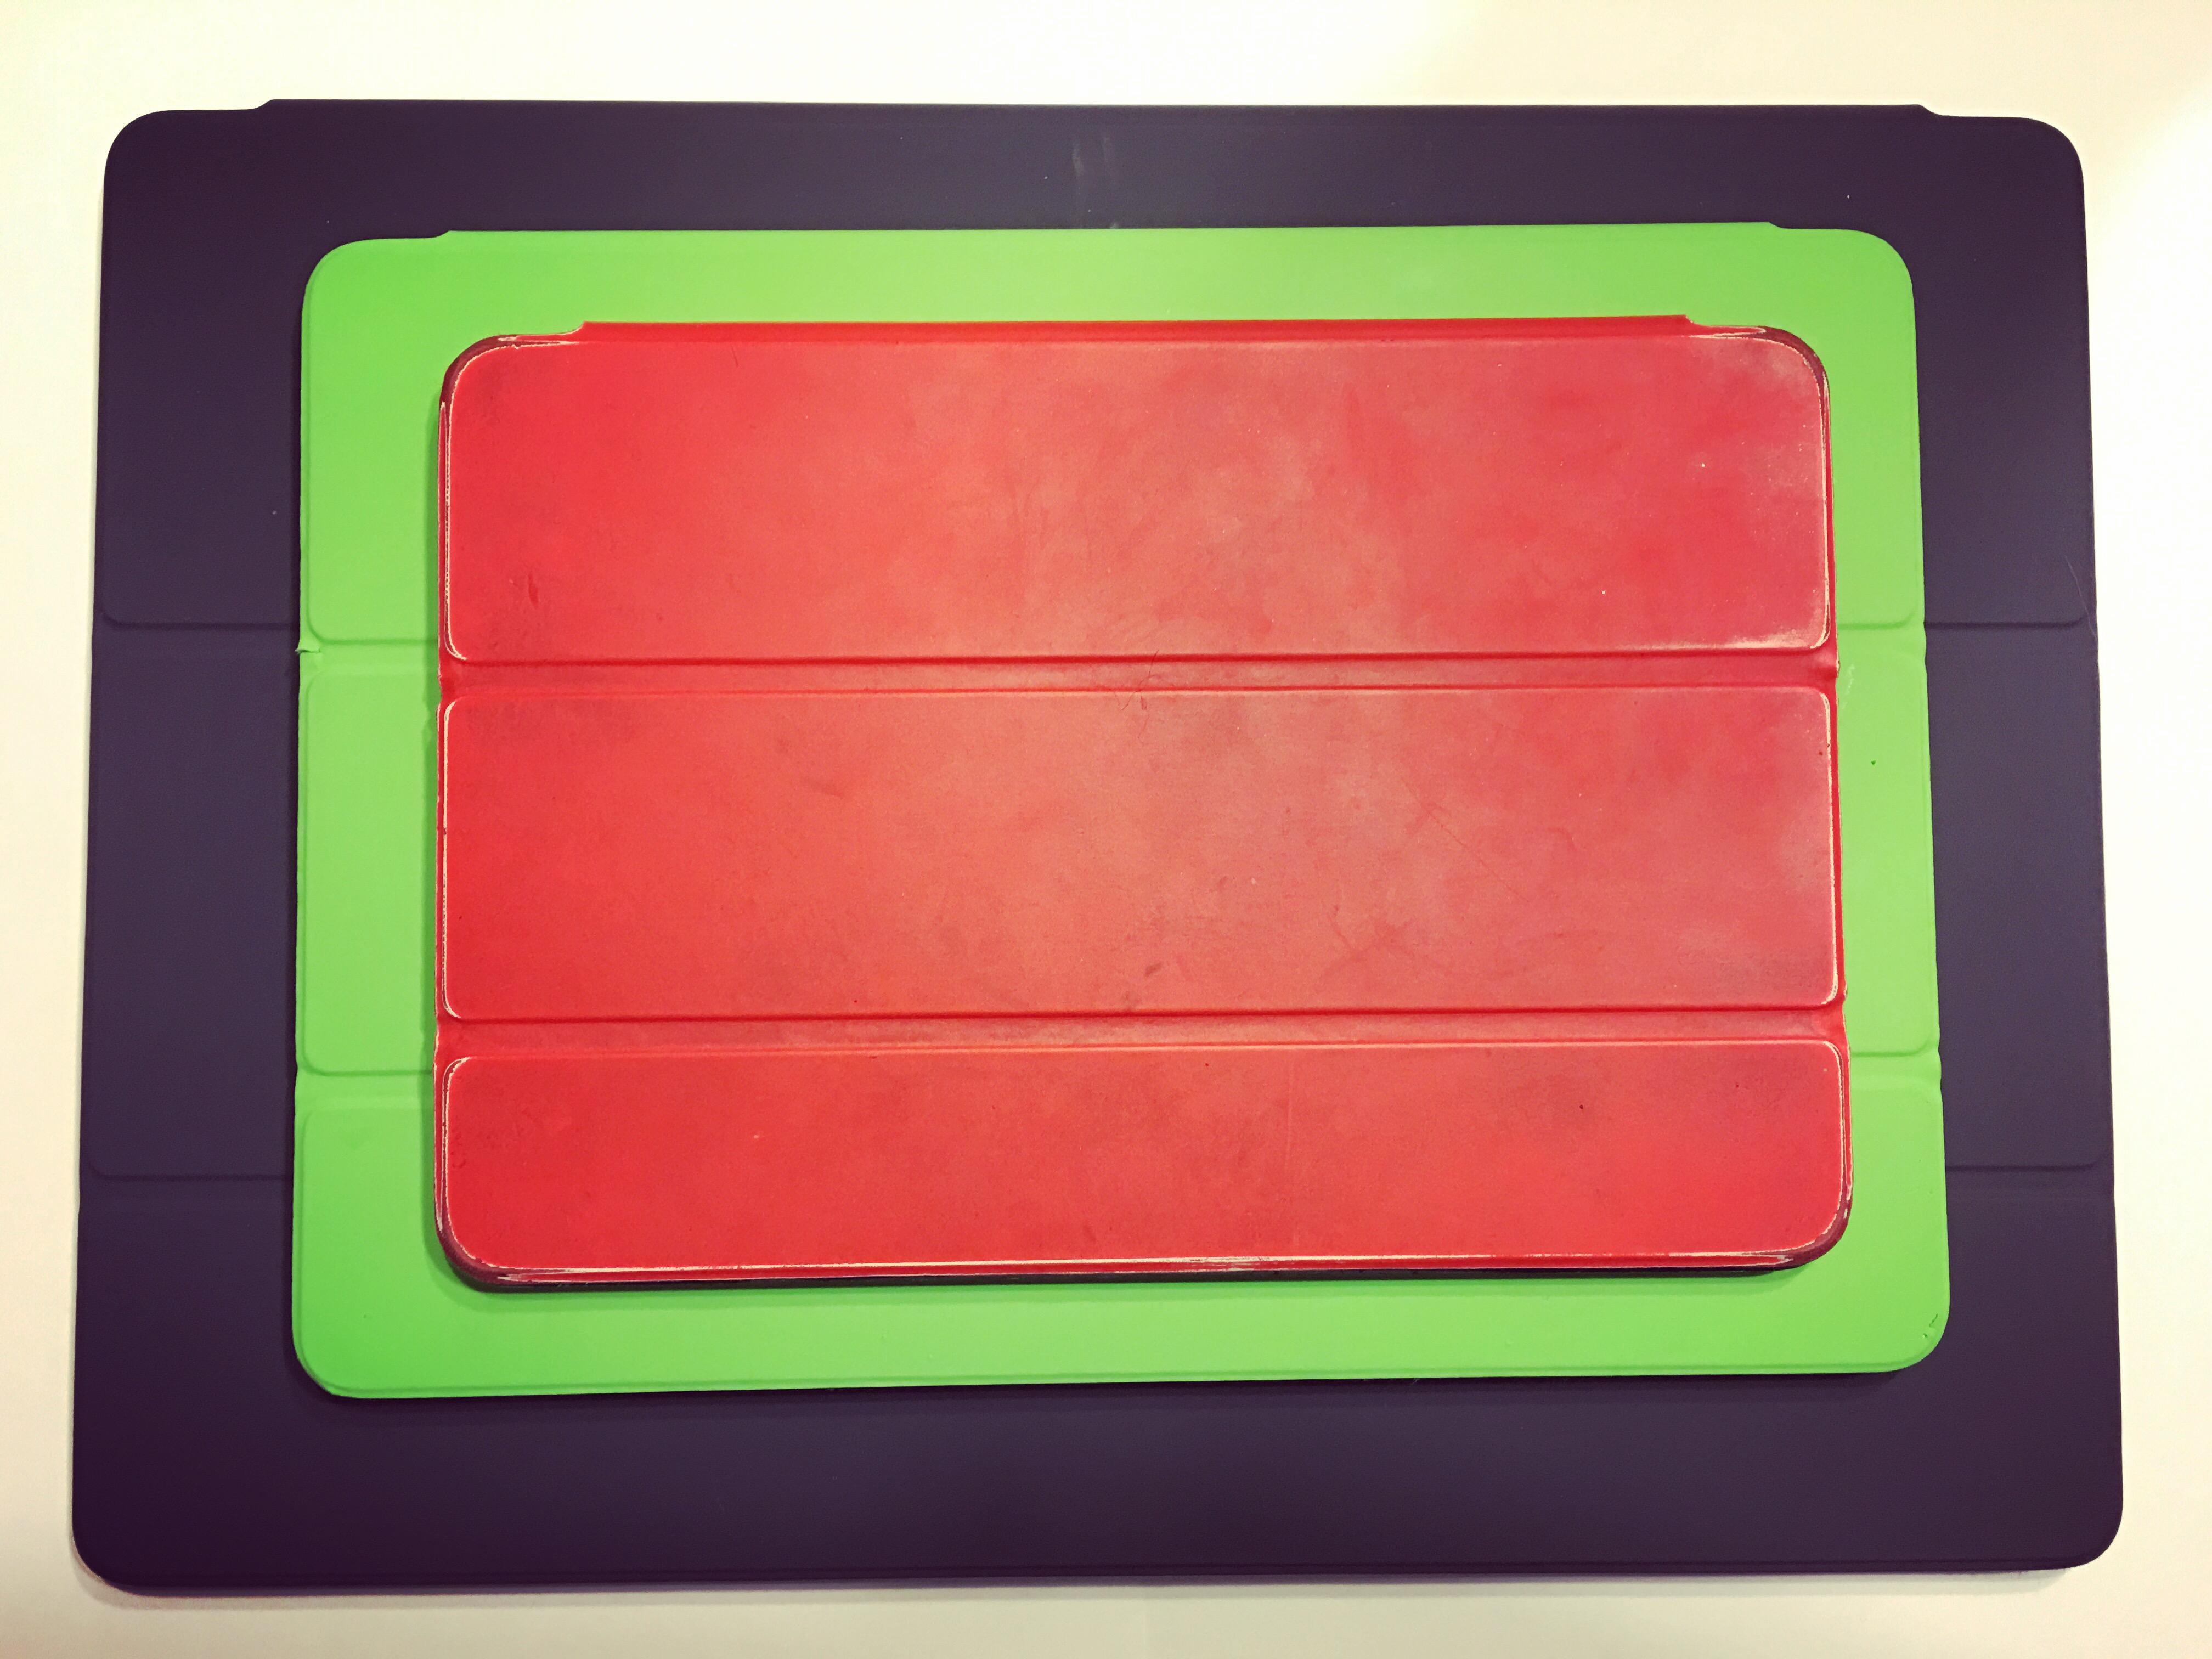 iPad mini Air Pro stacked